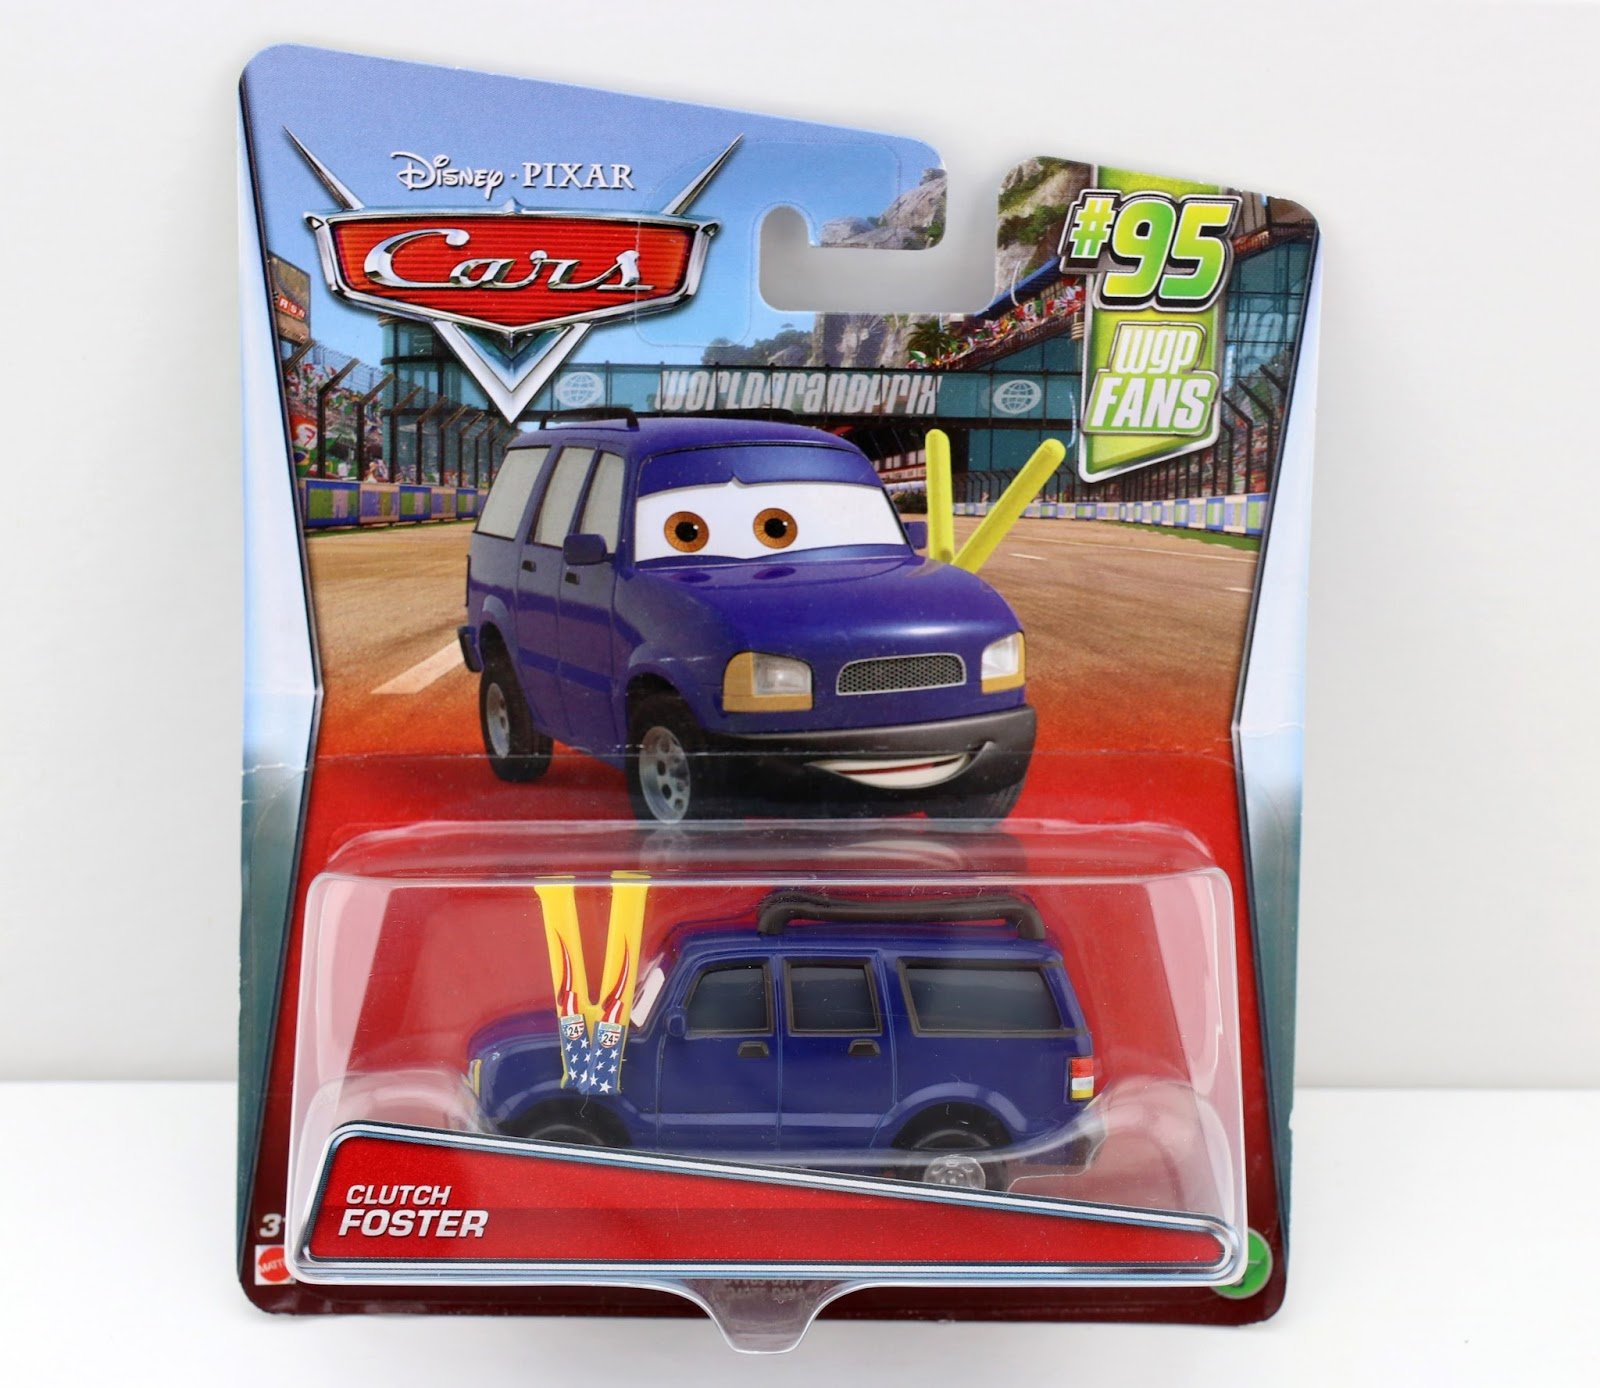 pixar cars mattel clutch foster